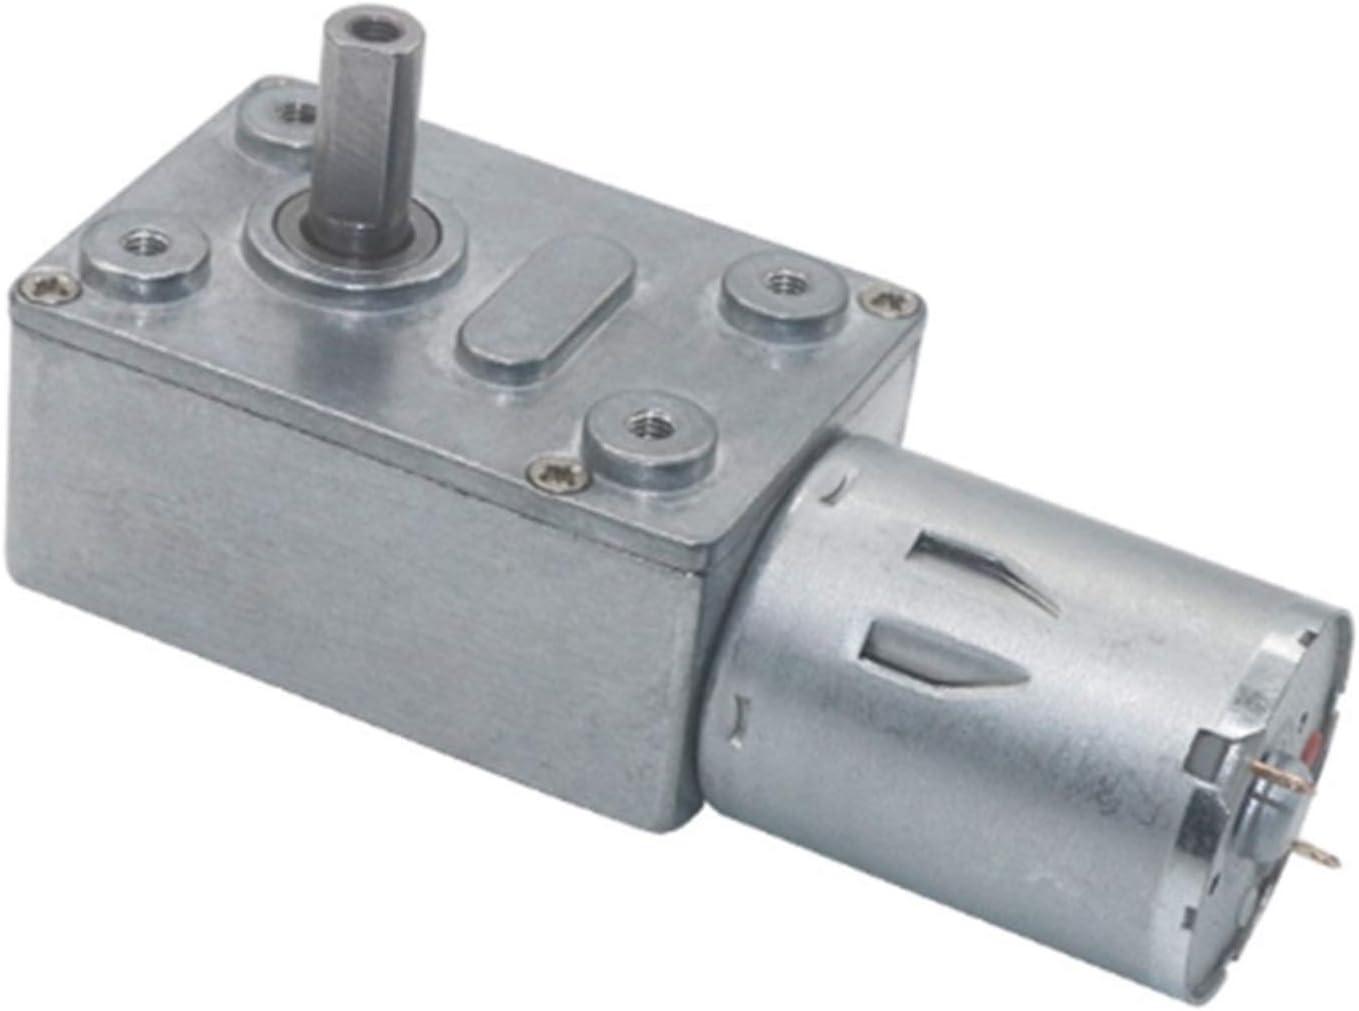 Micro Motor de reducción, DC 6 V 12V 24V Torque Alto Motor de Metal JGY-370 Motor de Engranaje Autoprocalante Tornillo de Enredadera Turbina para Modelo de Juguete de Motor de Bricolaje